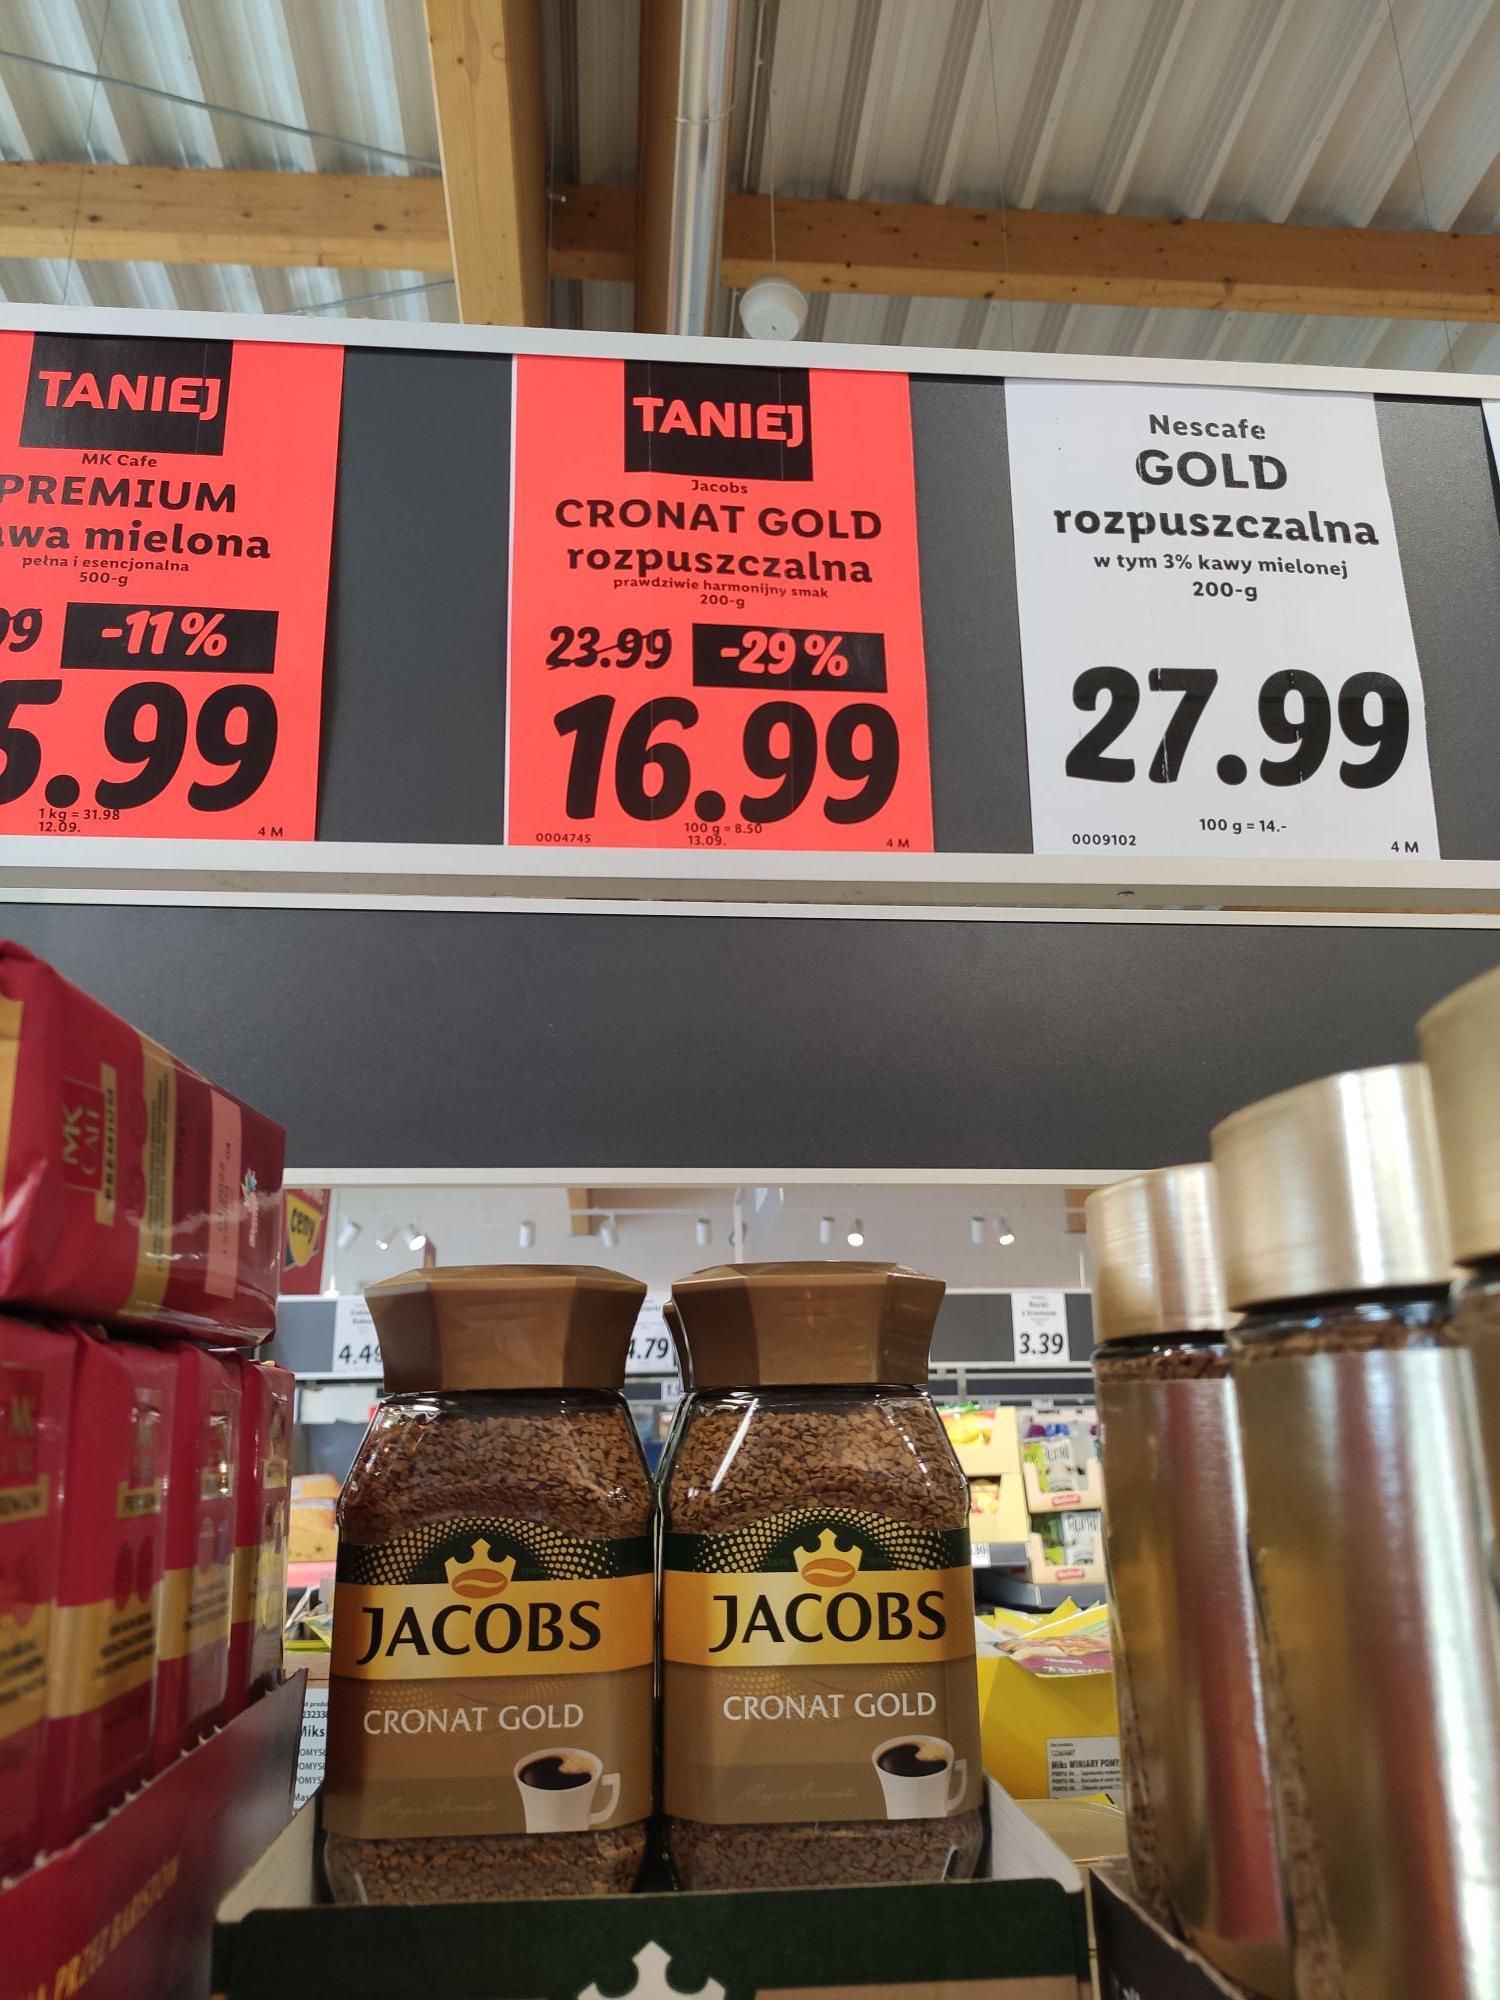 Jacobs Cronat Gold rozpuszczalna 200g @Lidl